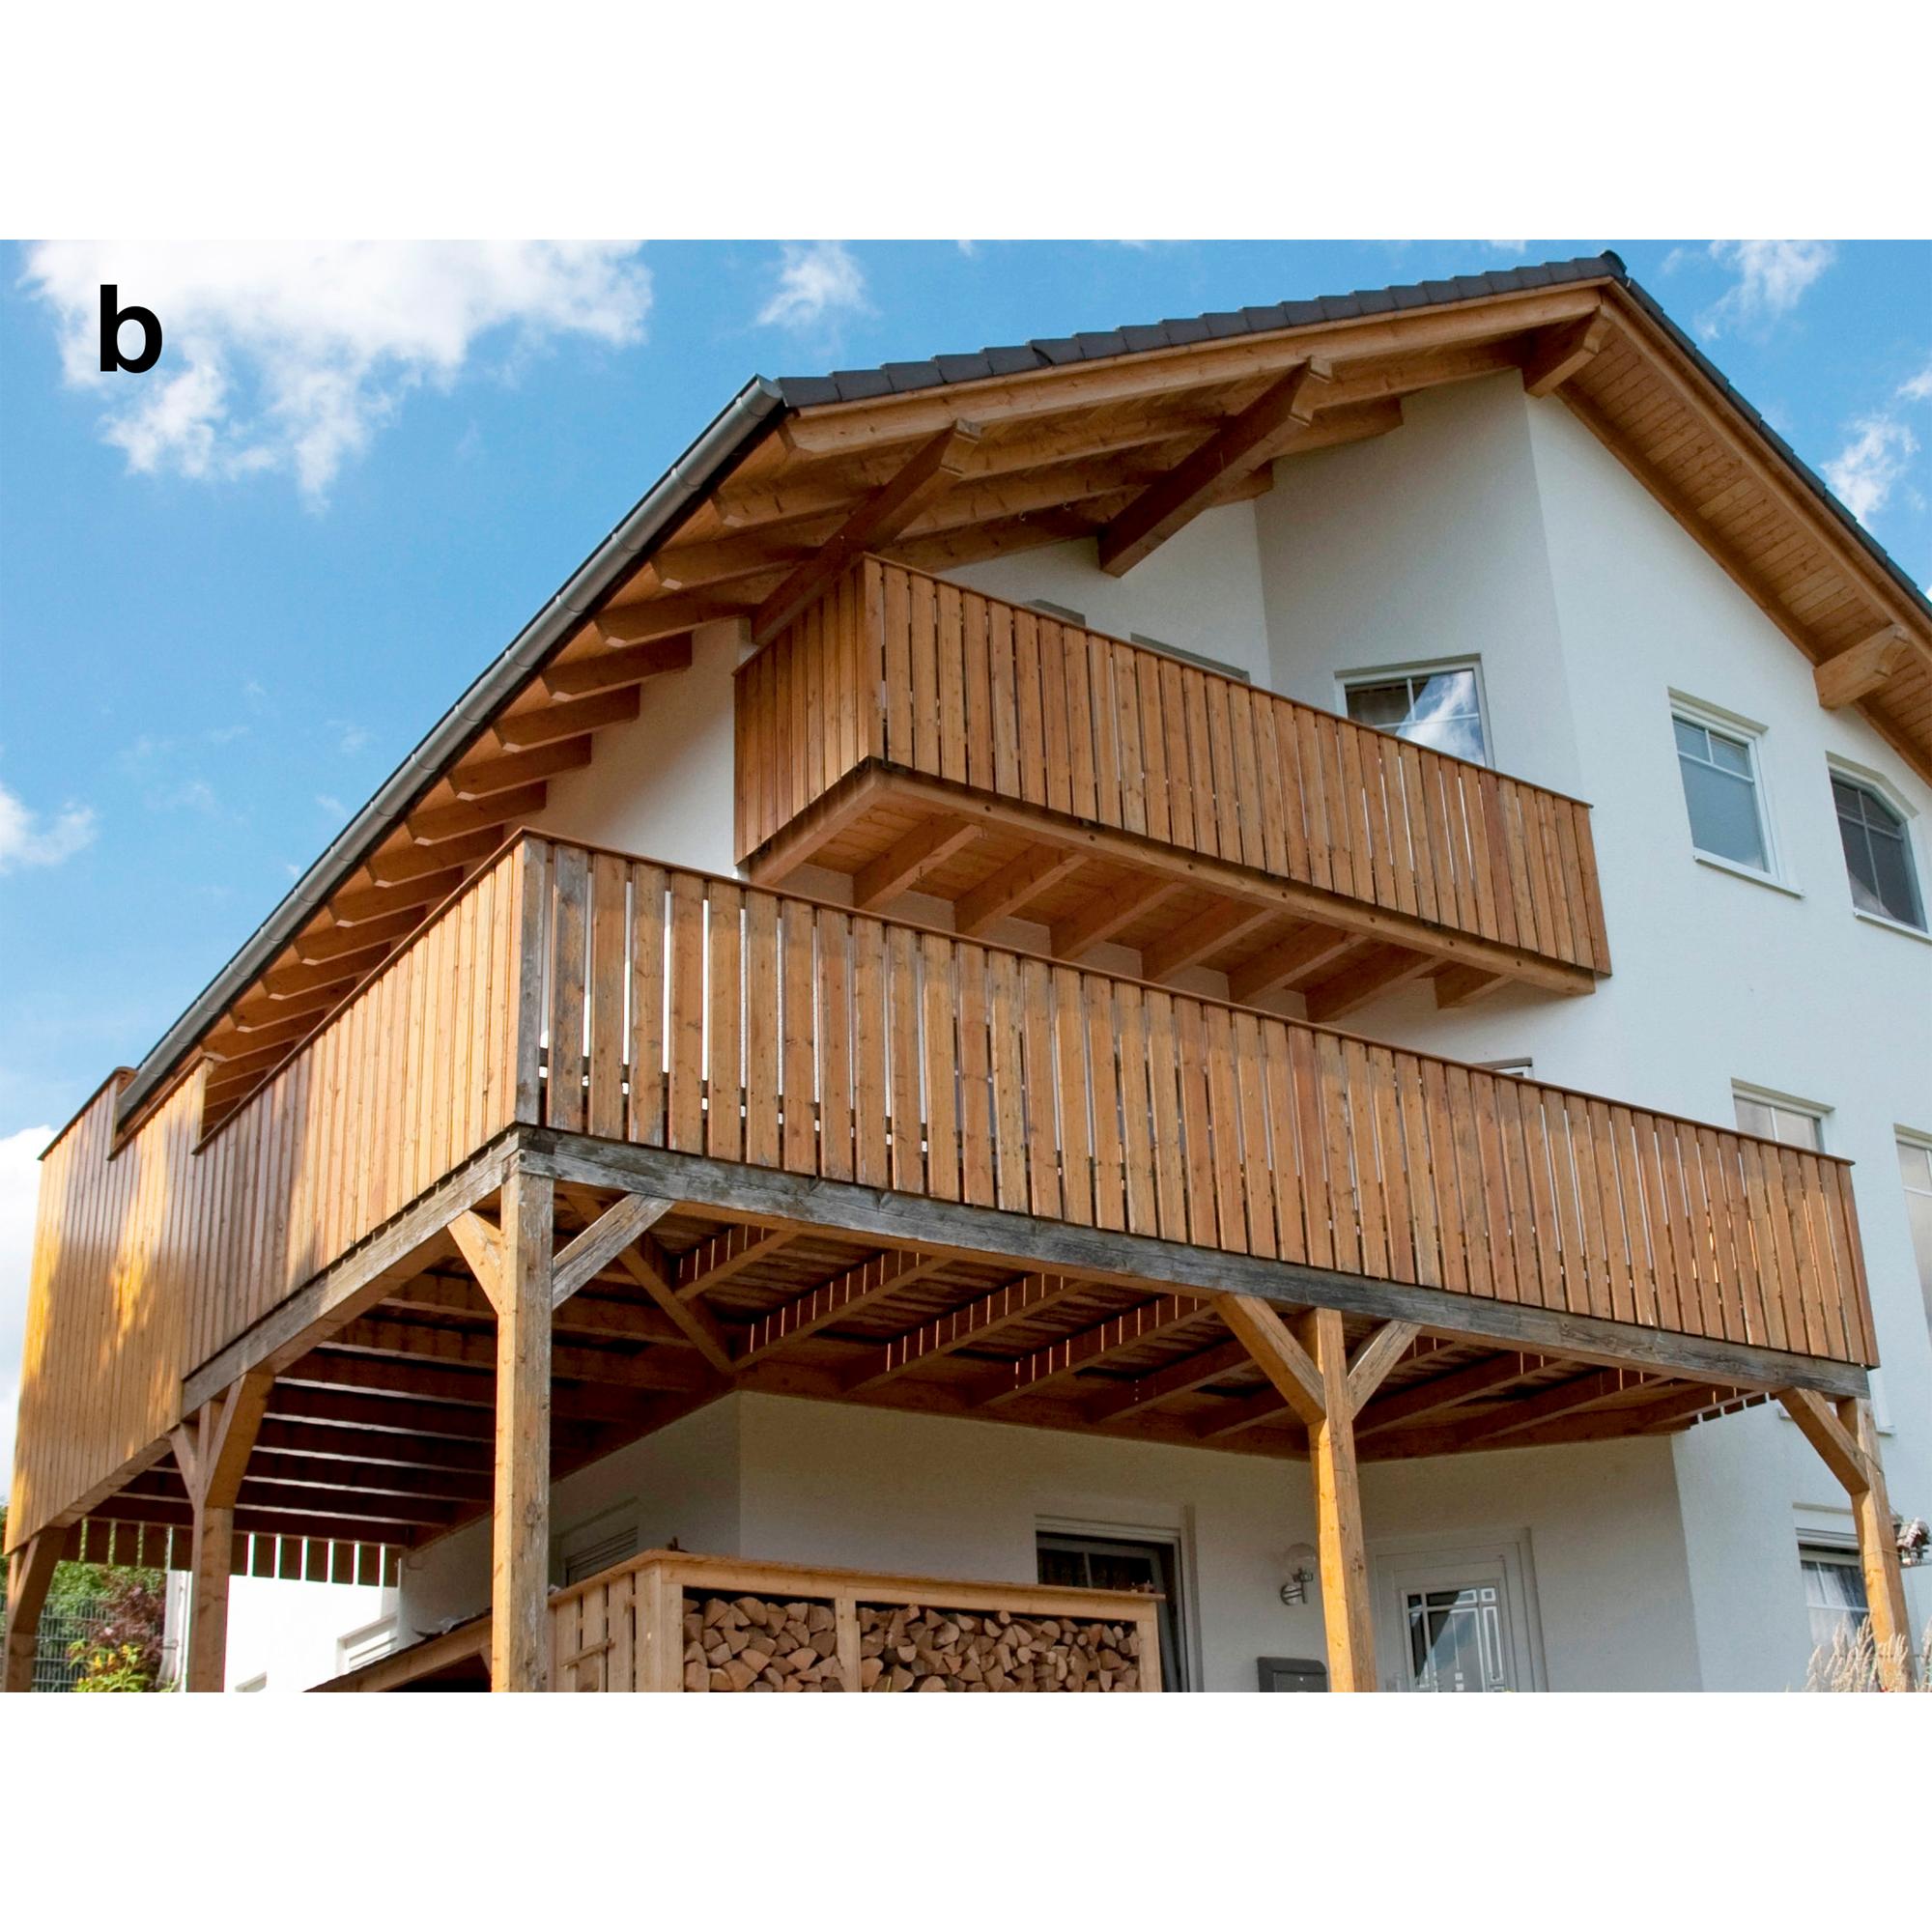 Balkonbrett Luzern 88 X 9 X 1 8 Cm ǀ Toom Baumarkt